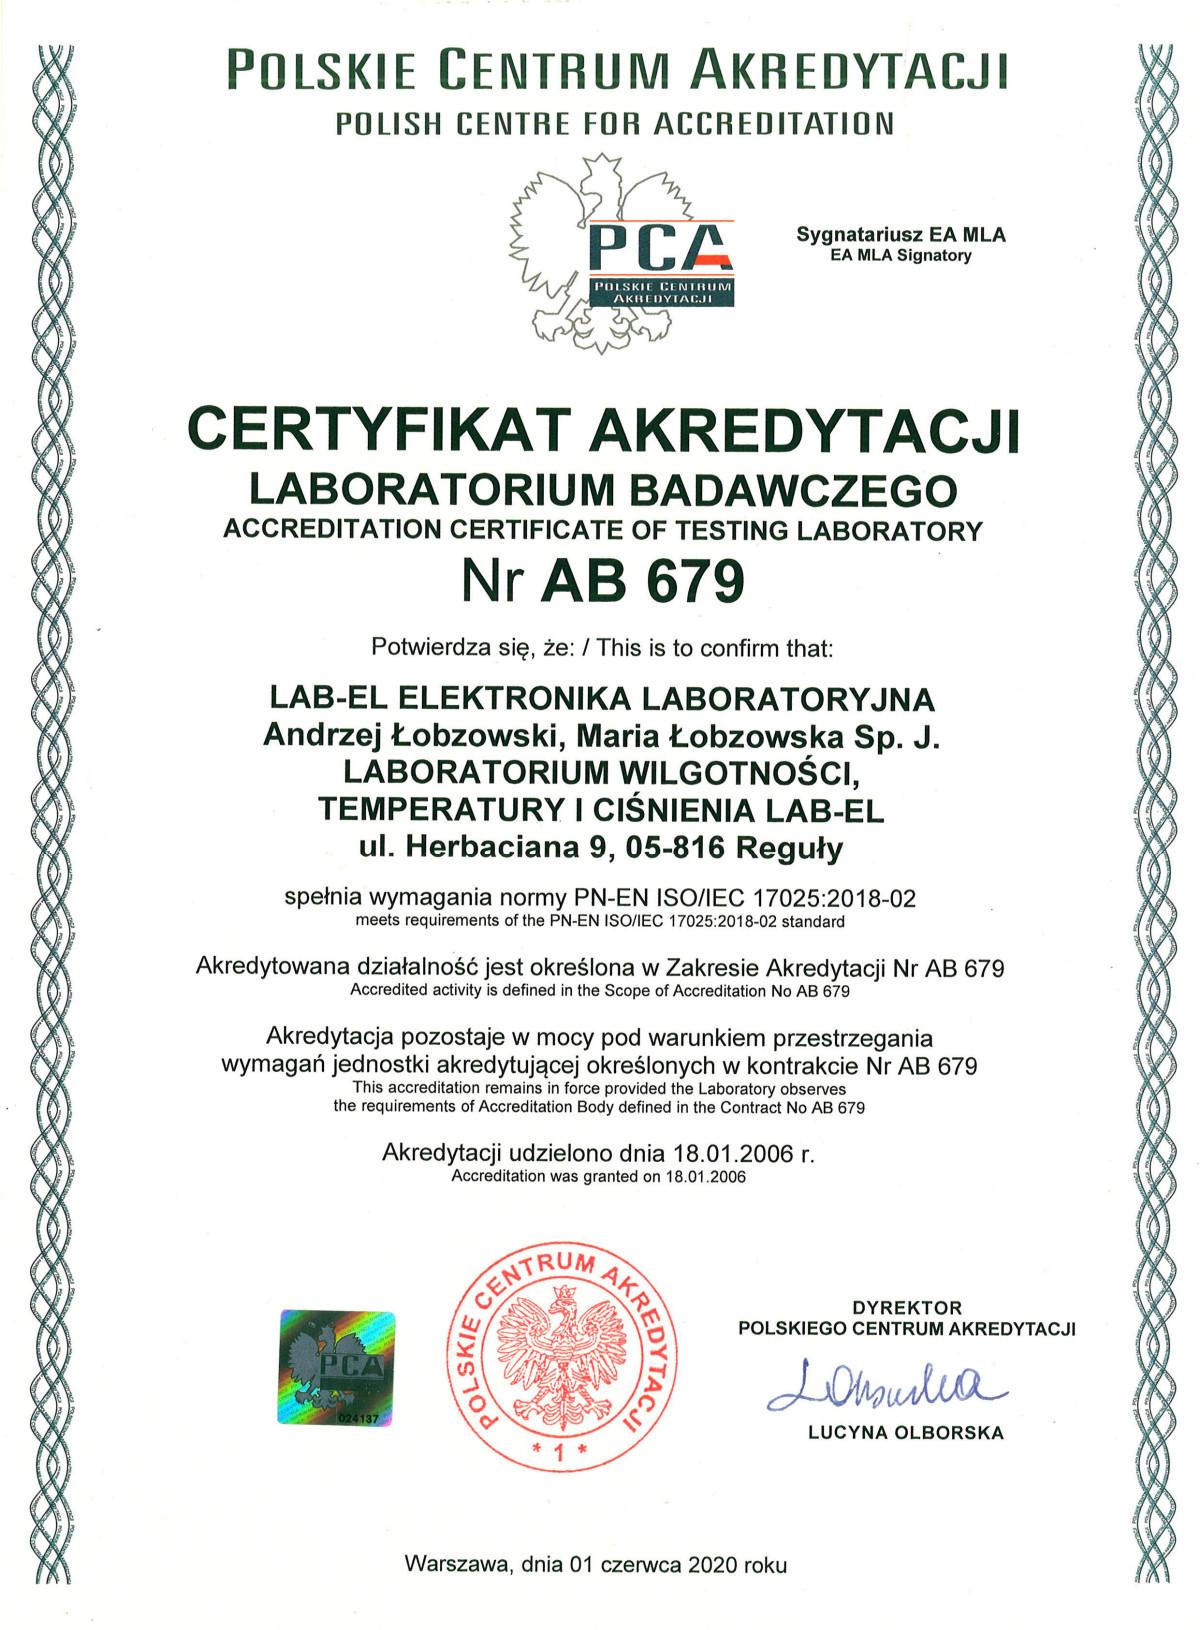 Certyfikat akredytacji nr AB 679